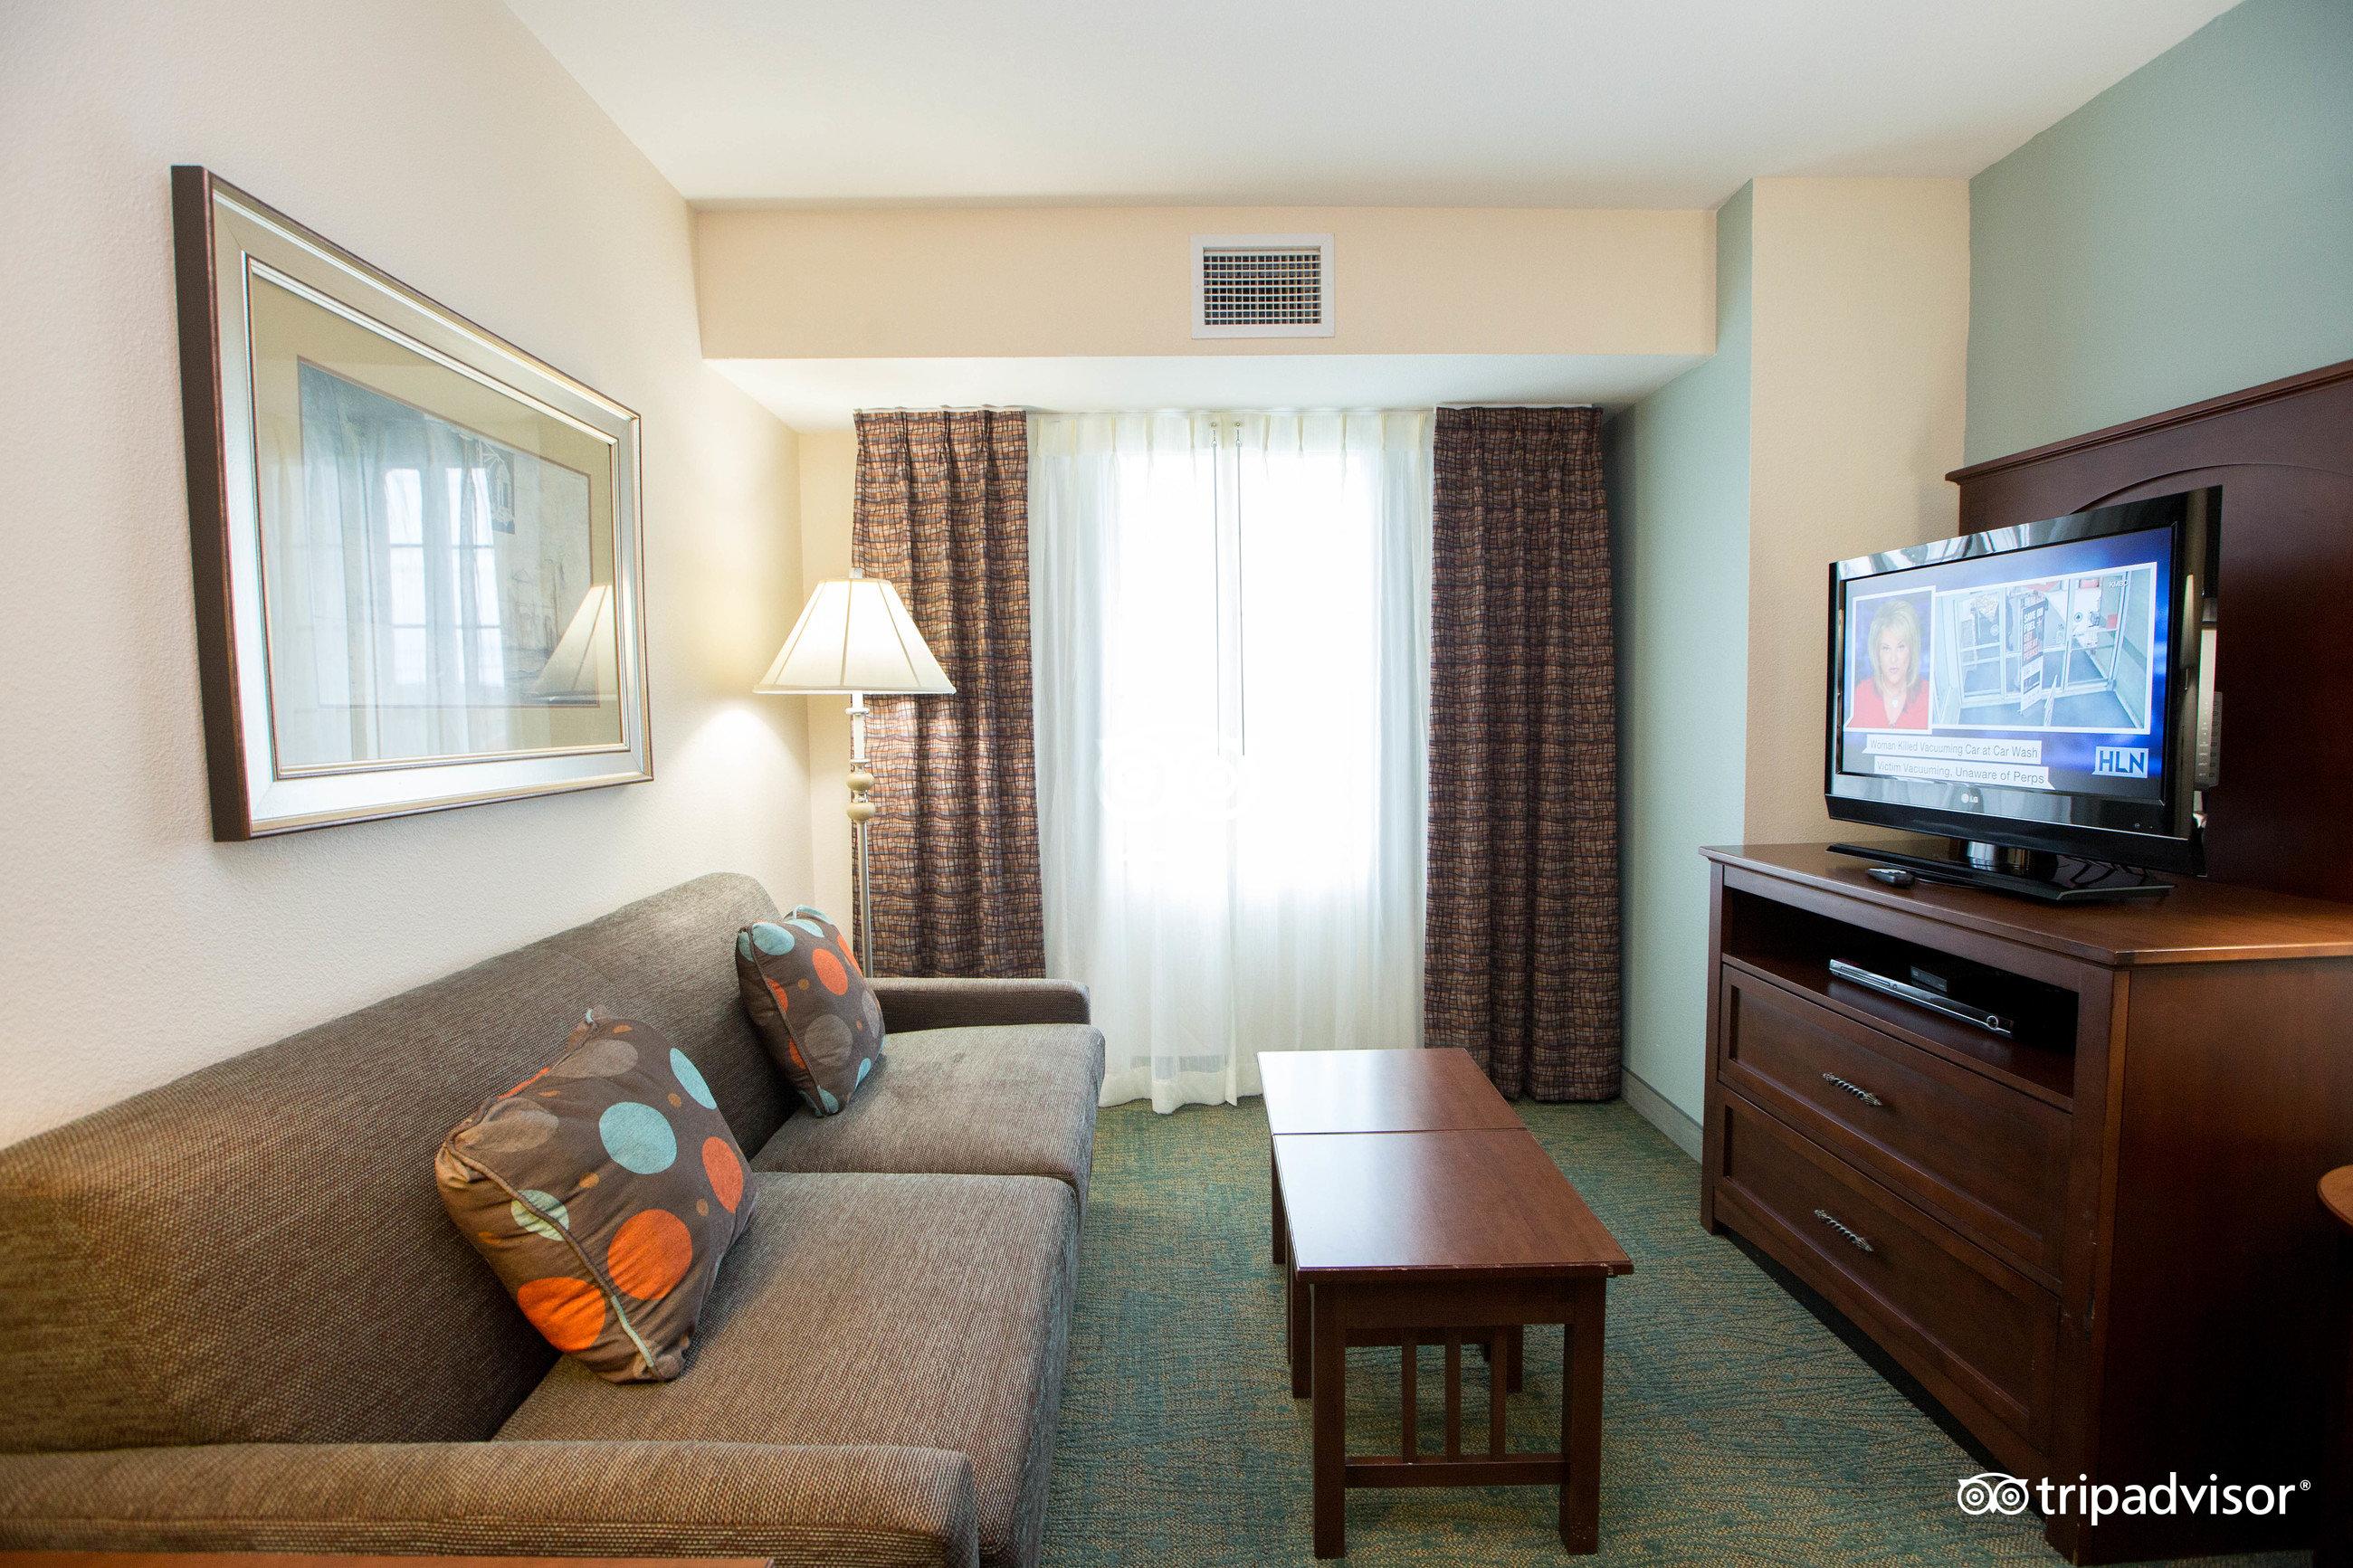 2 bedroom suites san antonio texas - home design - mannahatta